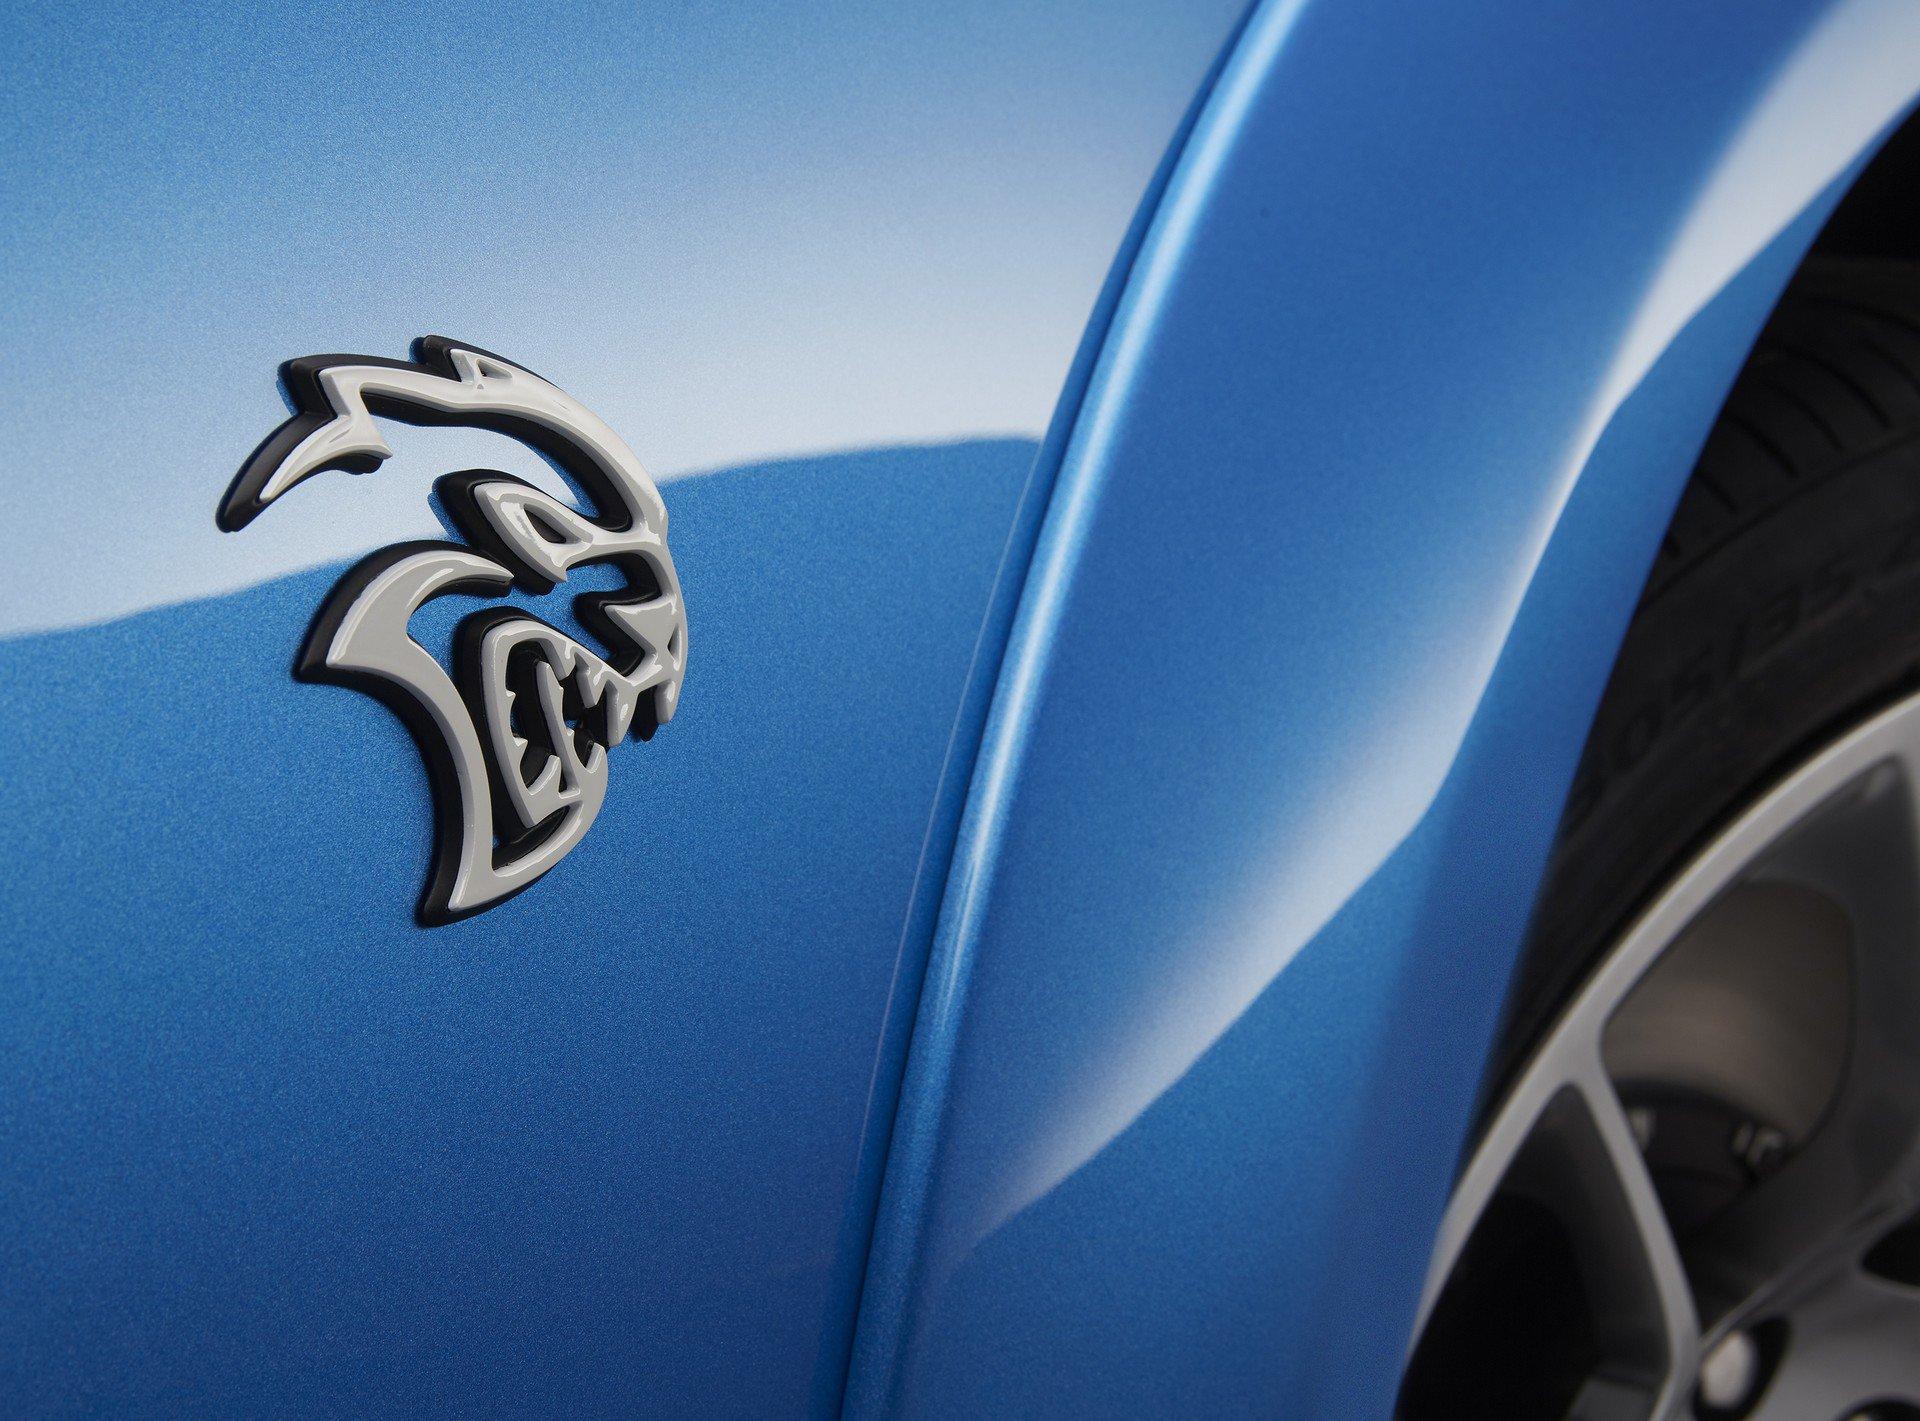 Dodge-Charger-SRT-Hellcat-Widebody-Daytona-50th-Anniversary-Edition-4